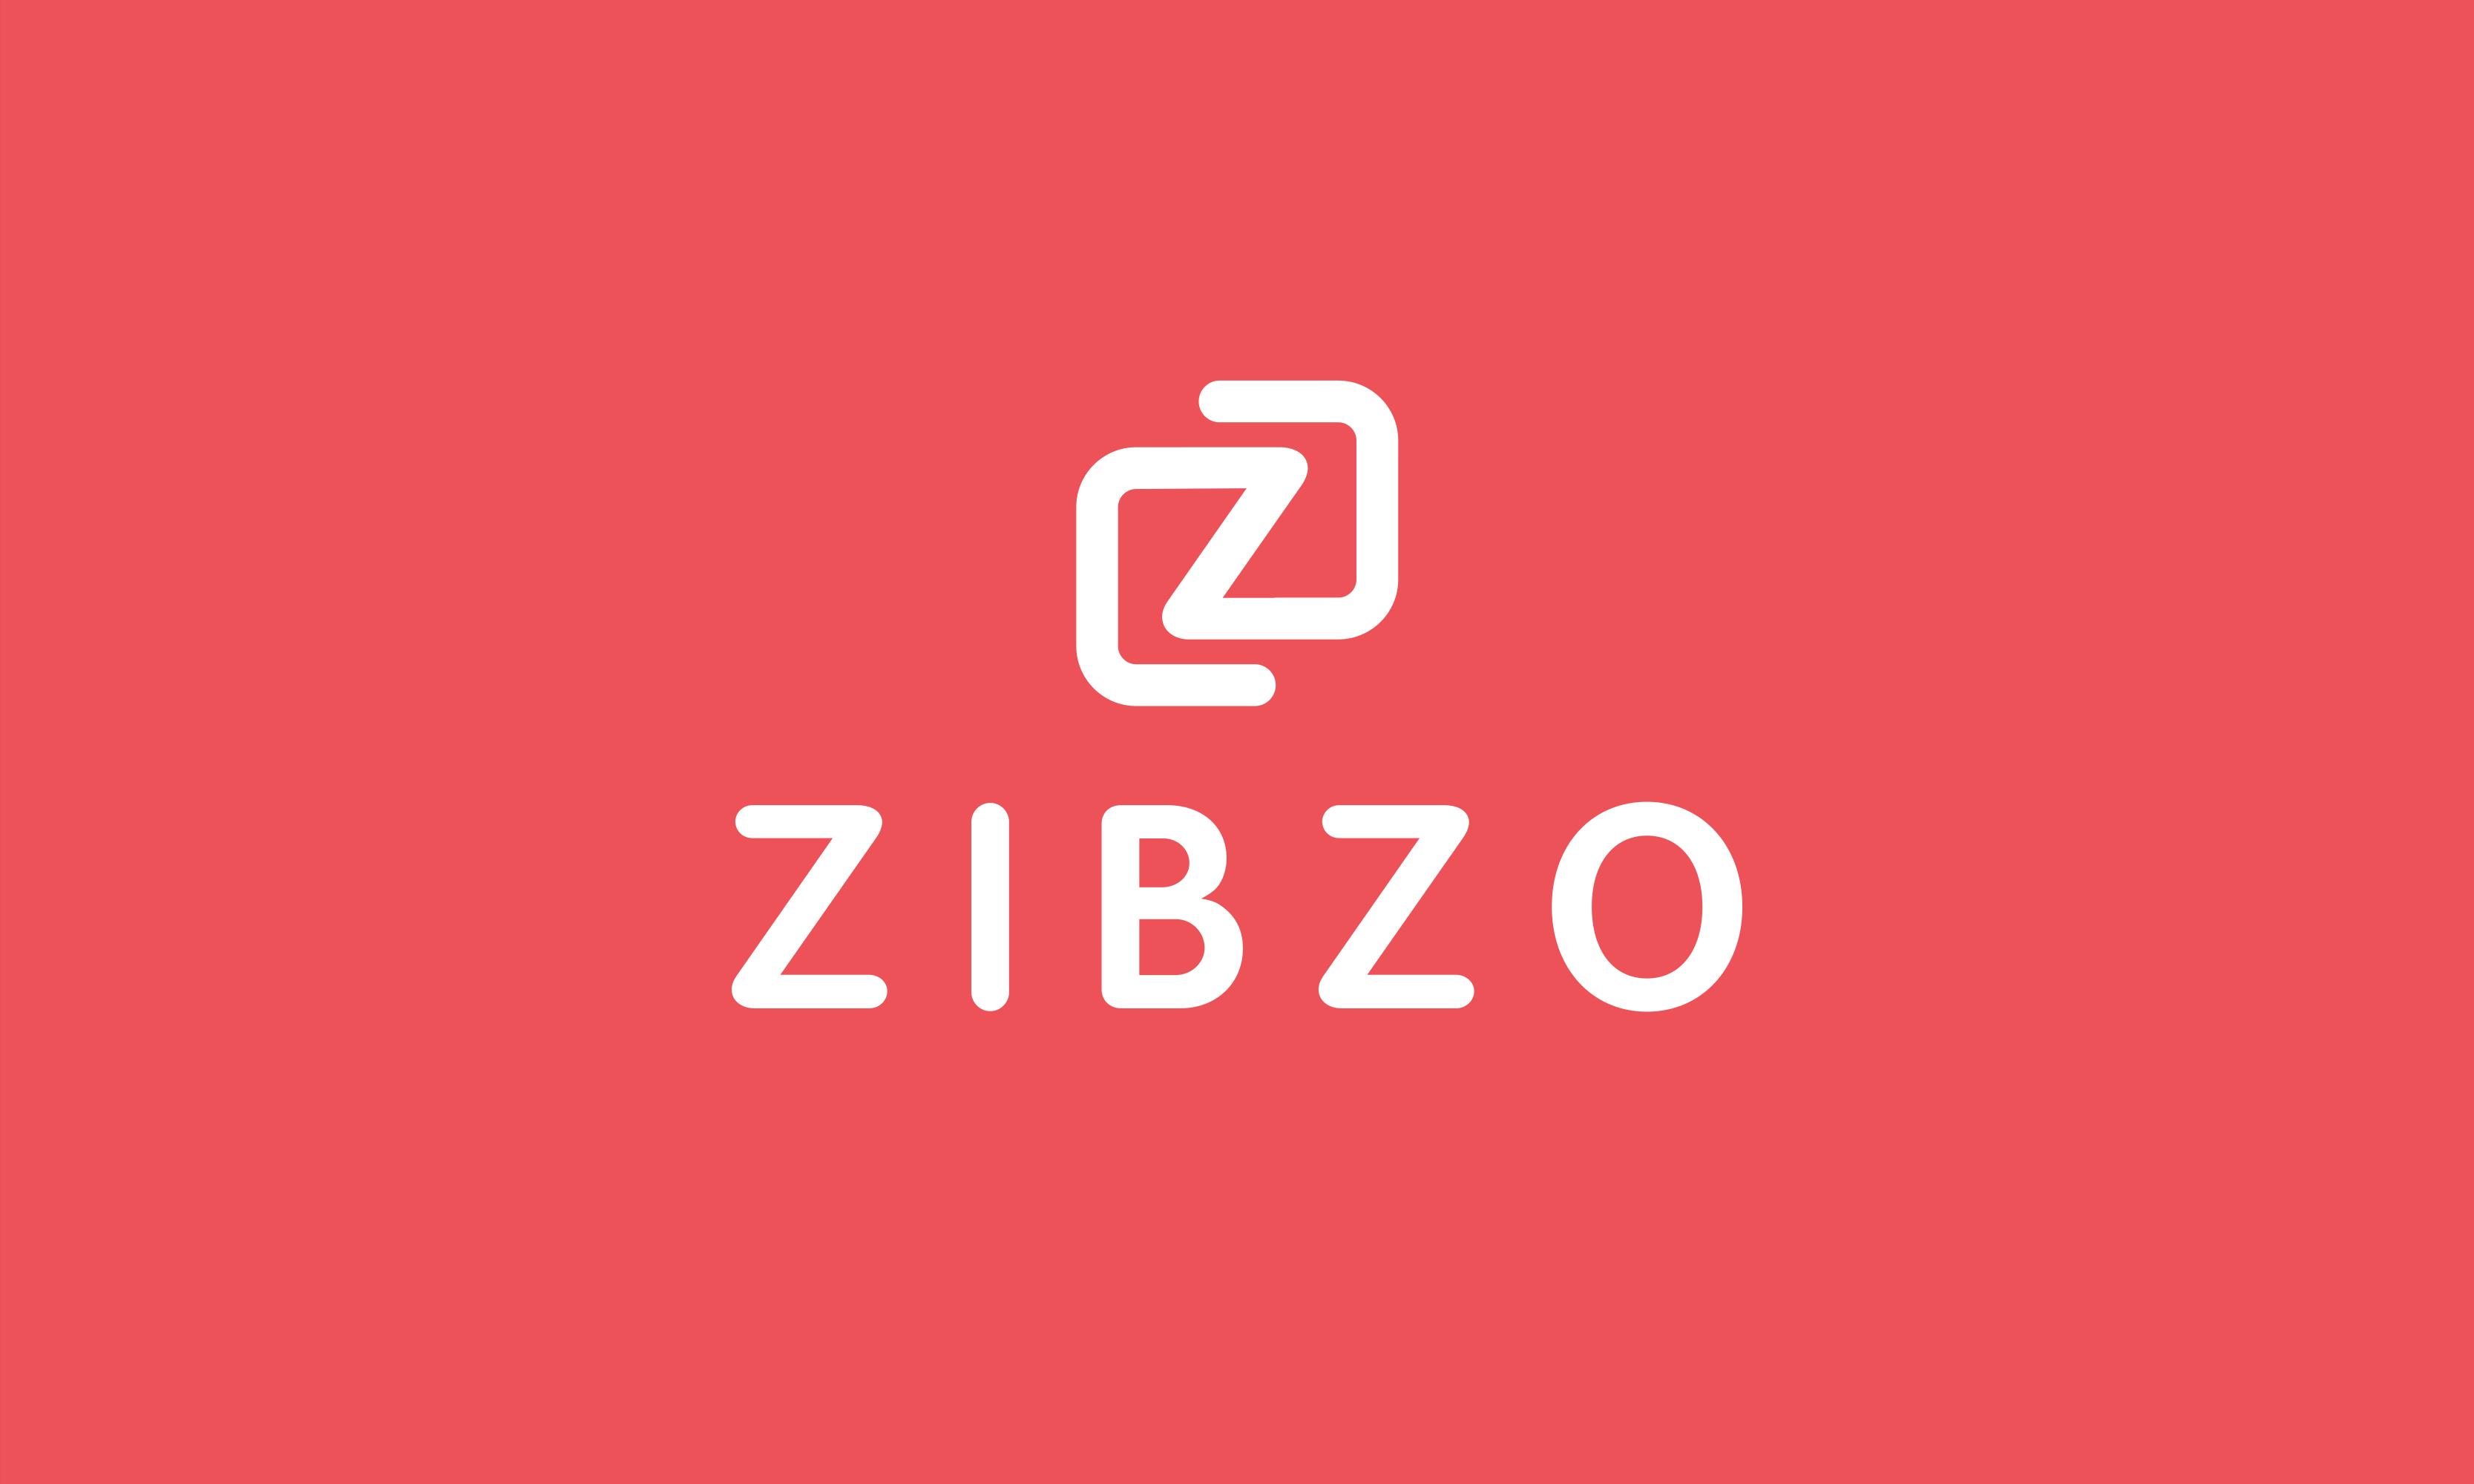 Zibzo